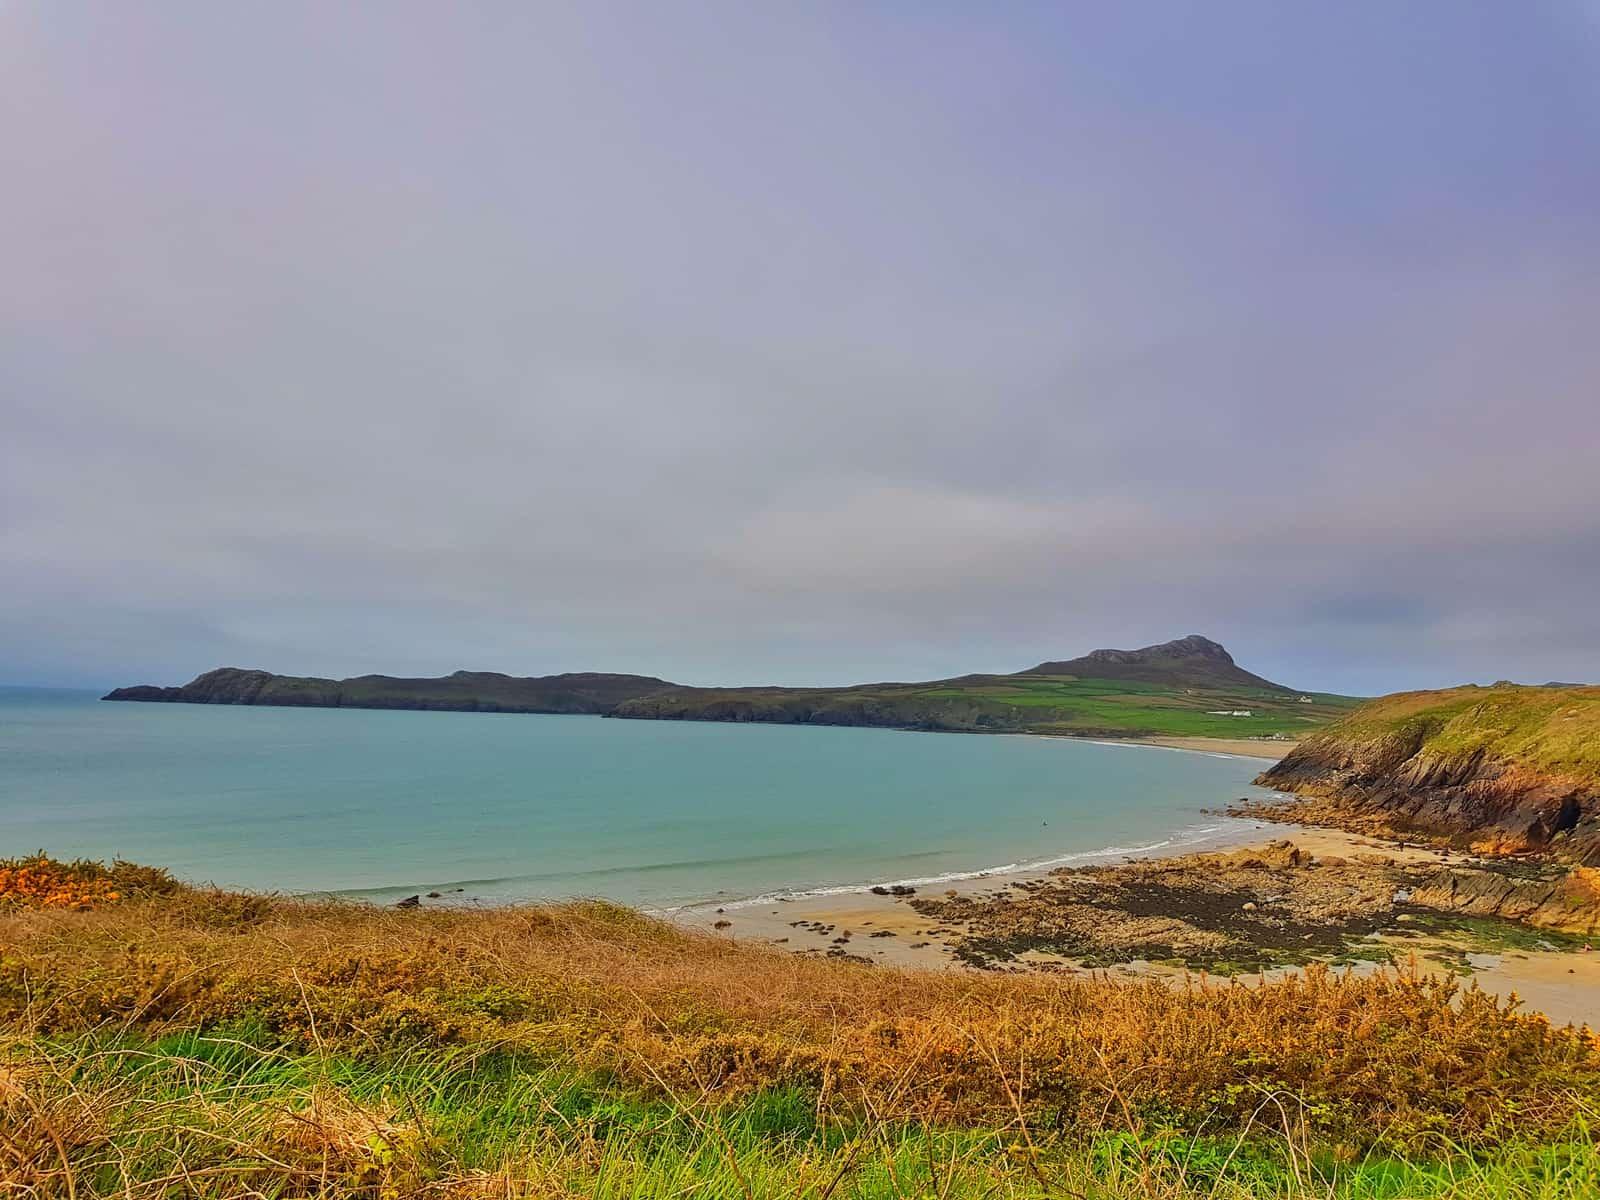 A view of blue sea and Porthsele, a Pembrokeshire open water swimming beach near Pencarnan farm campsite